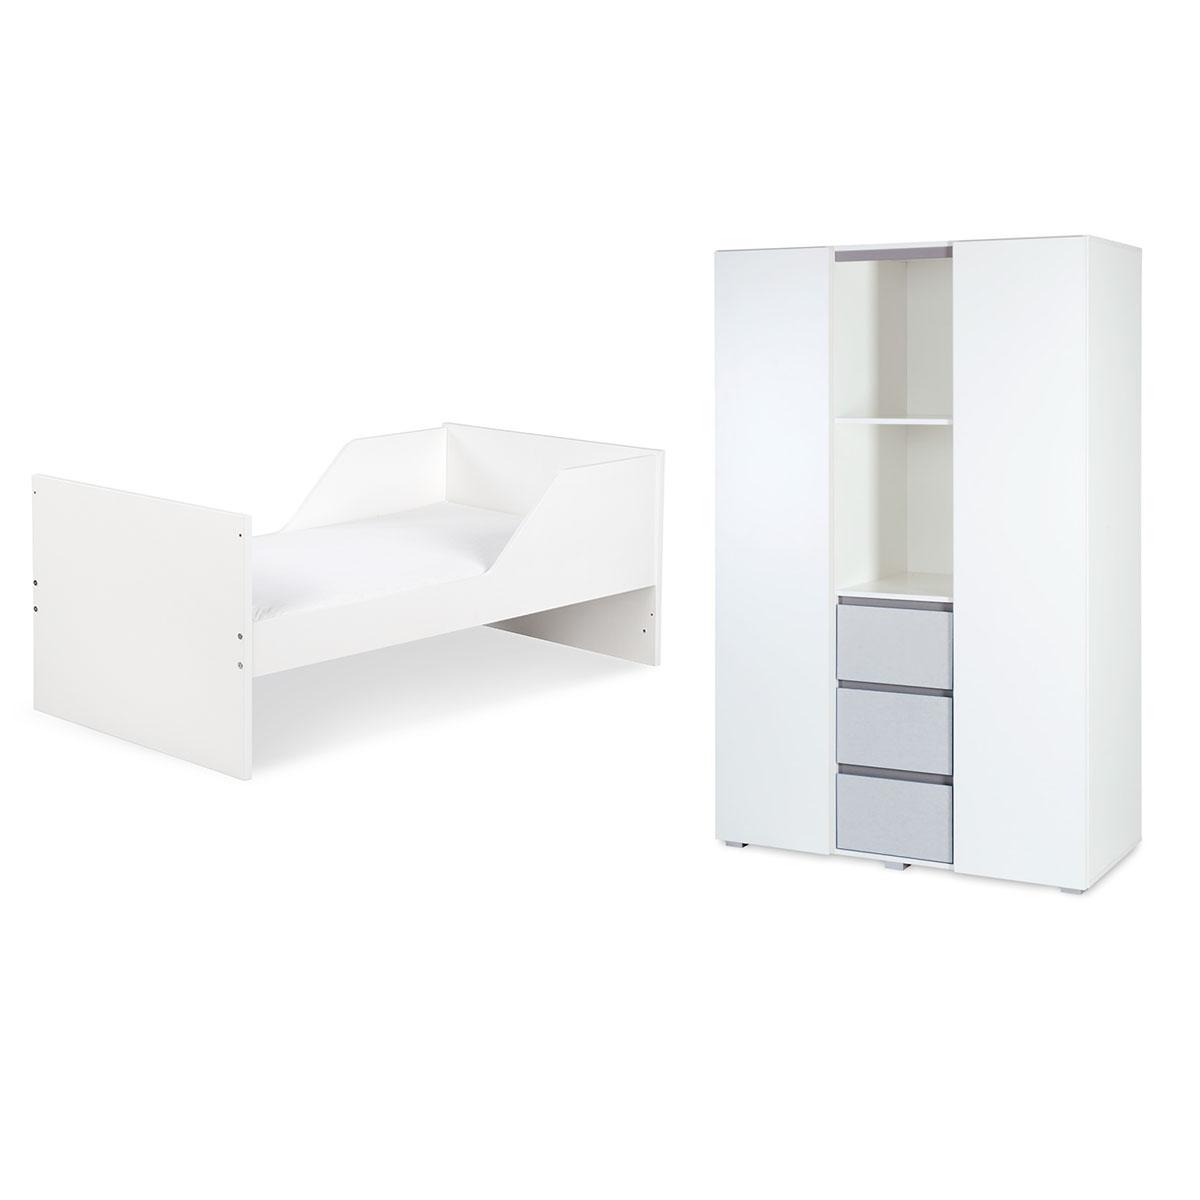 Lit évolutif 70x140 et armoire 3 portes LittleSky by Klups Dalia - Blanc